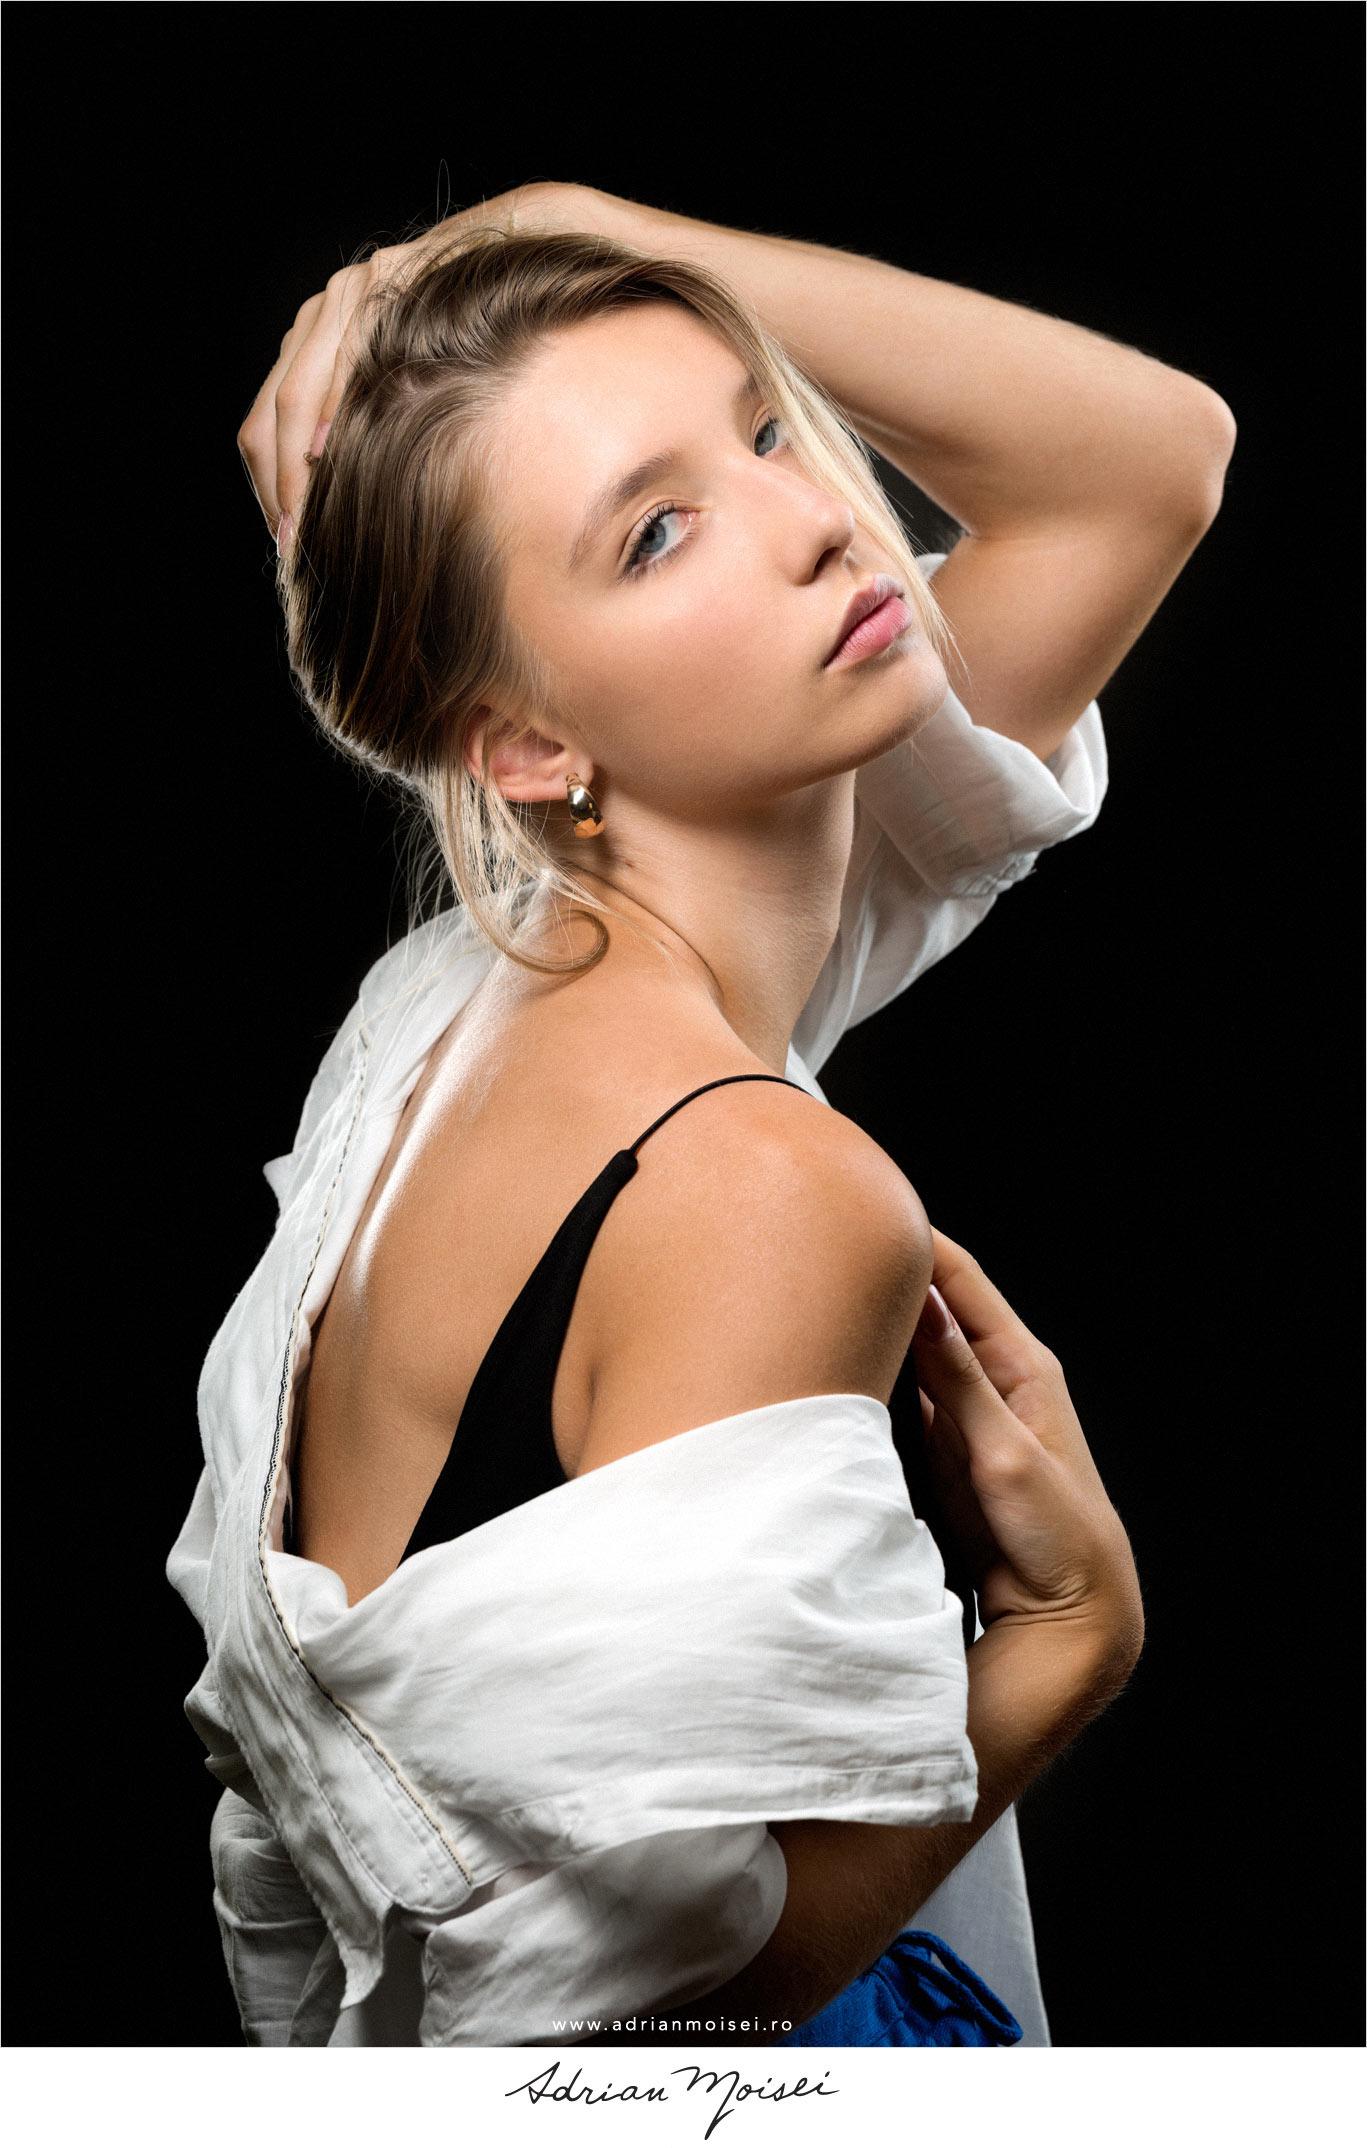 Fotograf fashion Iasi - fashion photographer bucuresti catwalk best models modelis agentie de fotomodele by Adrian -Moisei aka Nicholas Wave - Concept magazin online - studio - filmmaker - limited edition print - fine art - exhibition